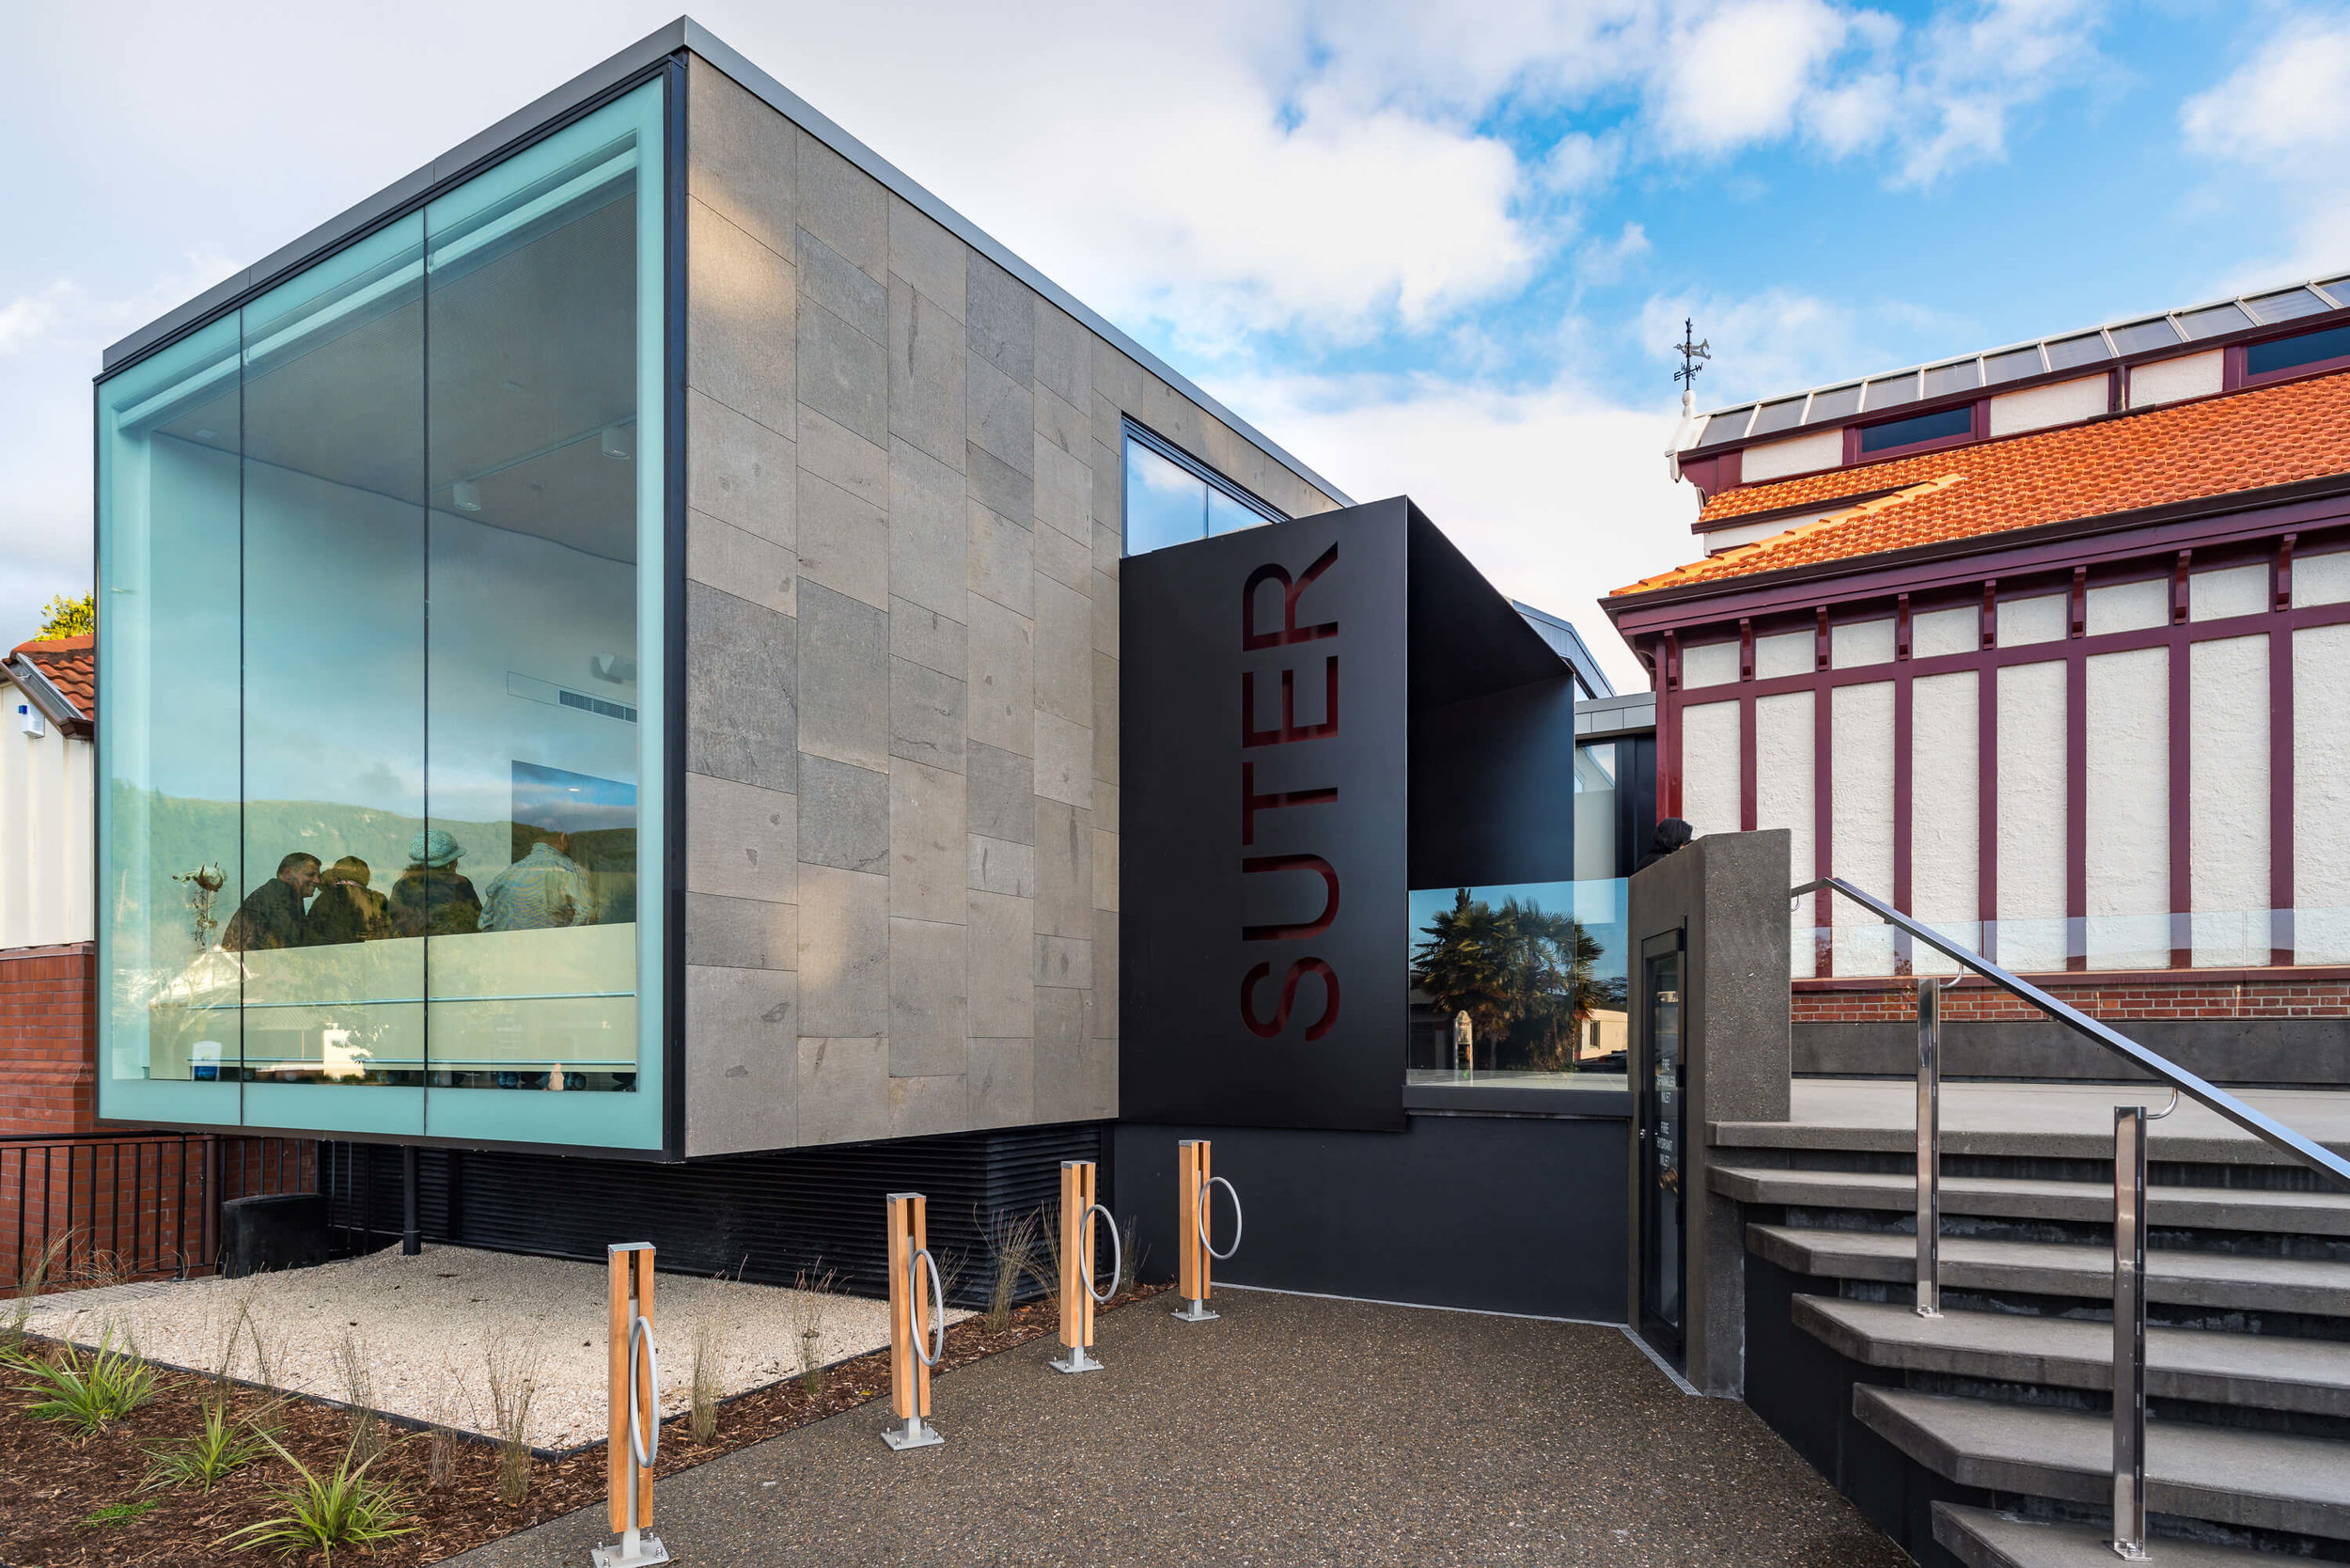 Nelson's Suter art gallery entrance